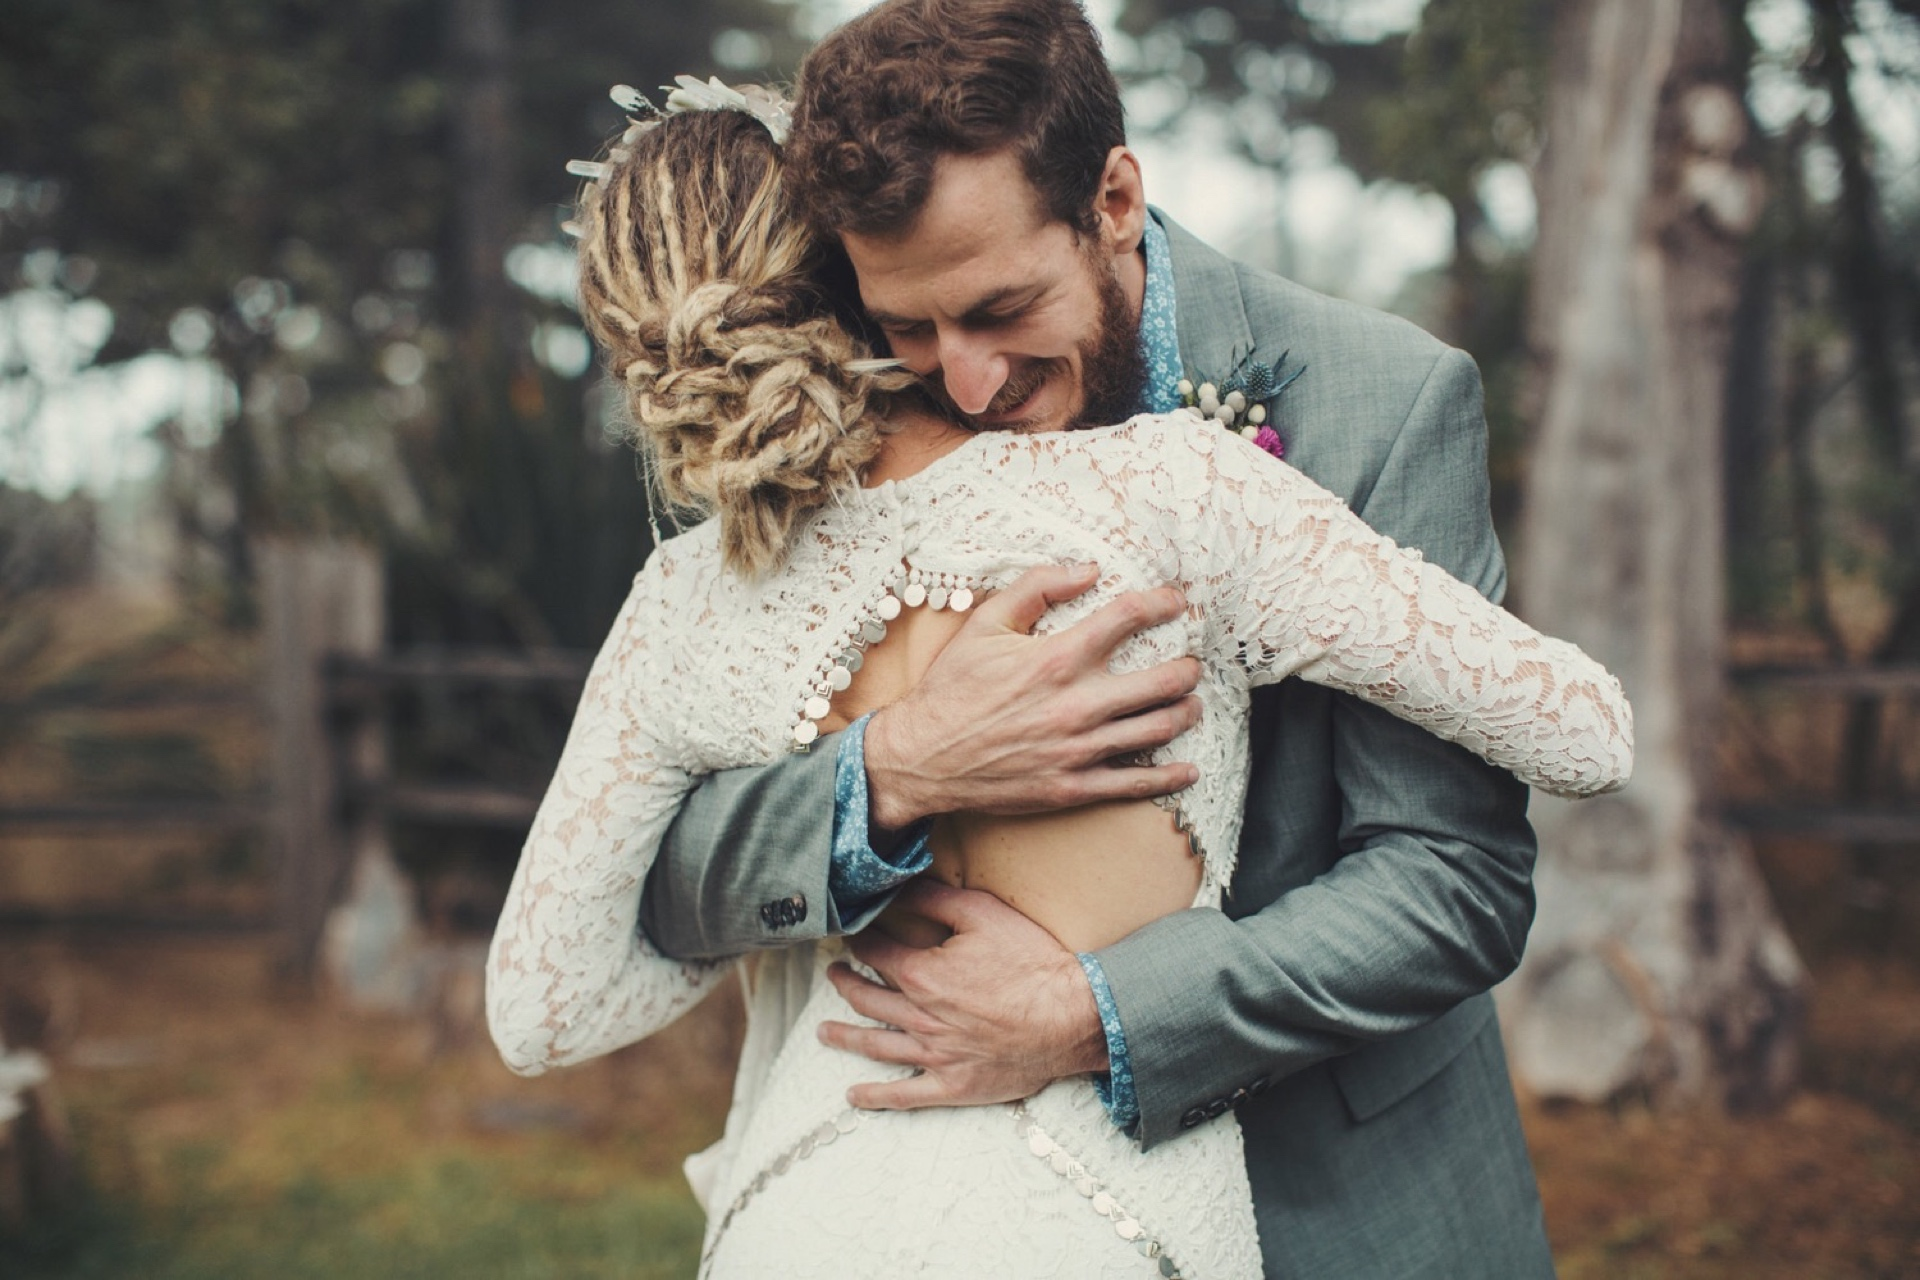 Holly's Ocean Meadow wedding